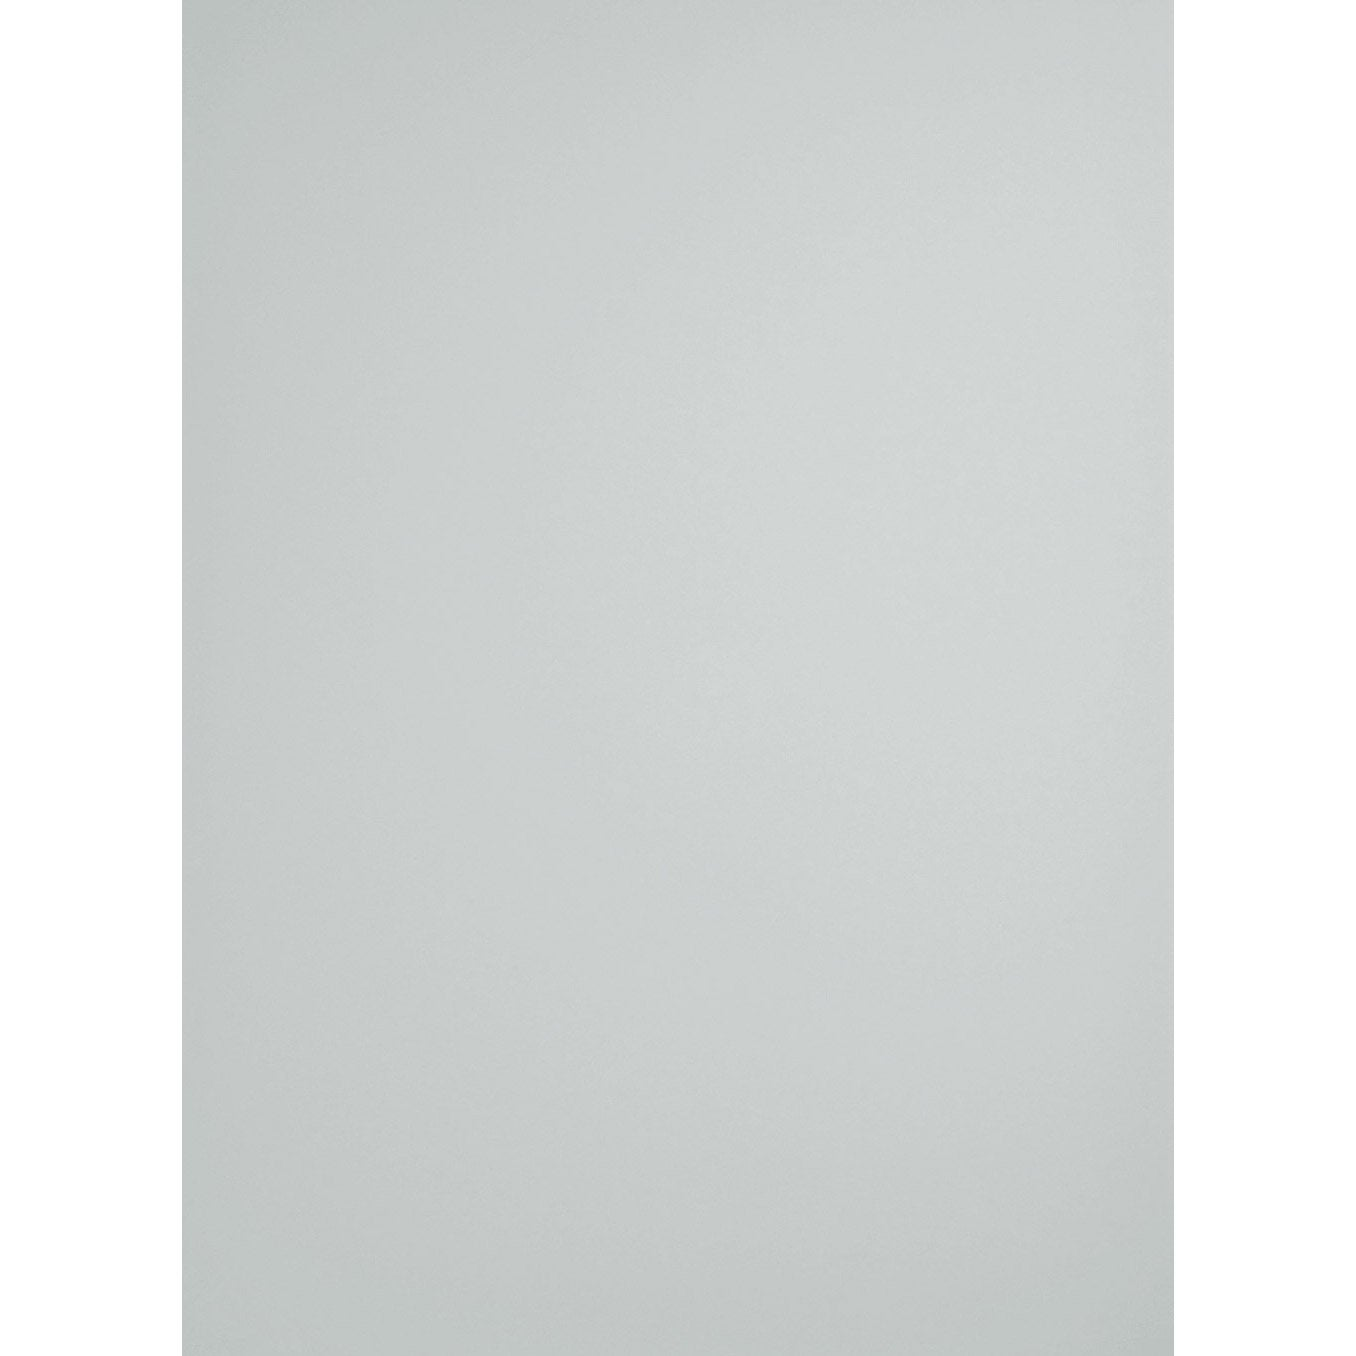 verre clair blanc laiteux x cm 4 mm leroy merlin. Black Bedroom Furniture Sets. Home Design Ideas